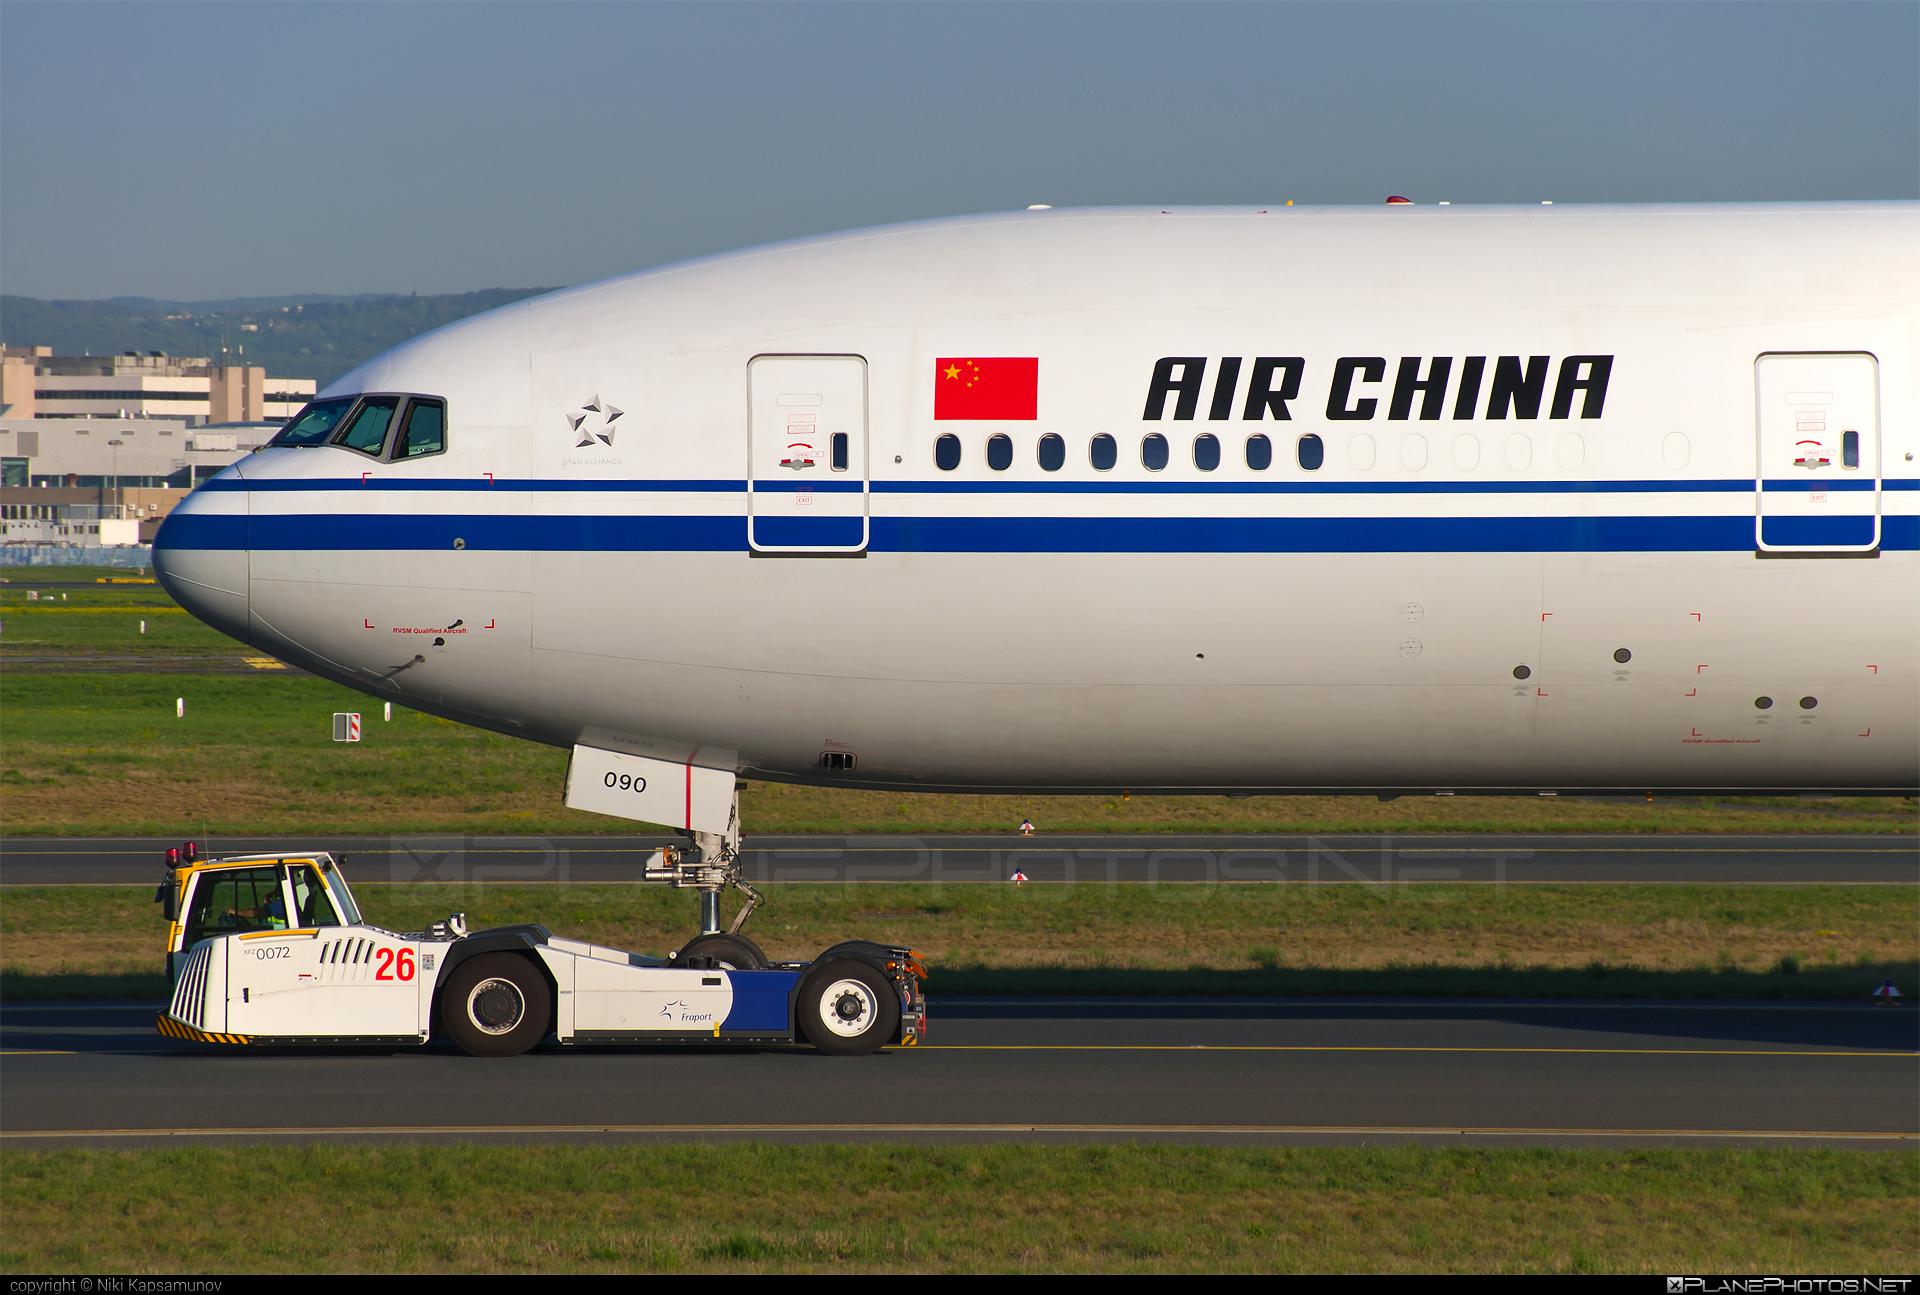 Air China Boeing 777-300ER - B-2090 #airchina #b777 #b777er #boeing #boeing777 #tripleseven